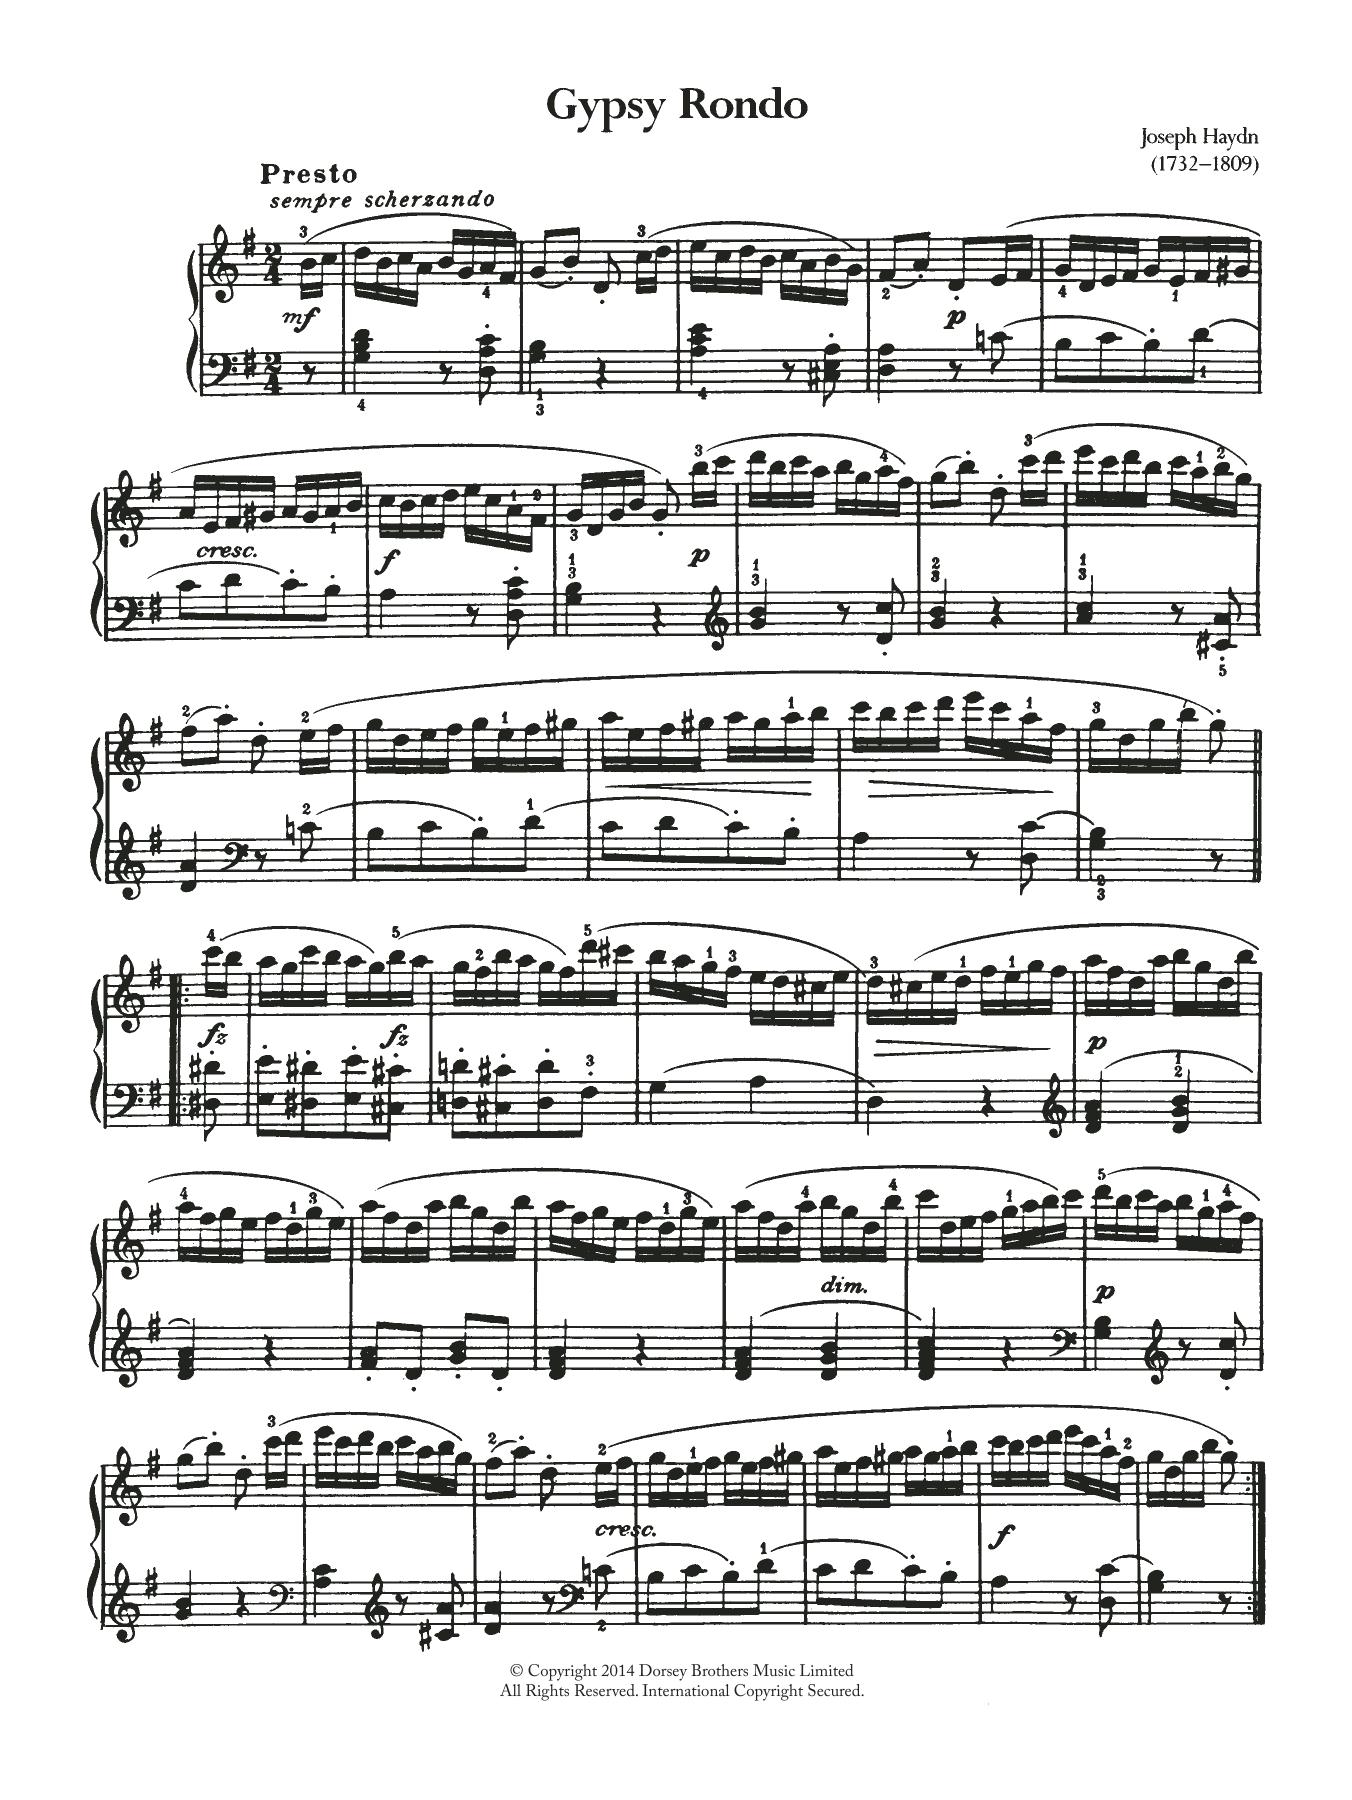 George Frideric Handel - Gypsy Rondo